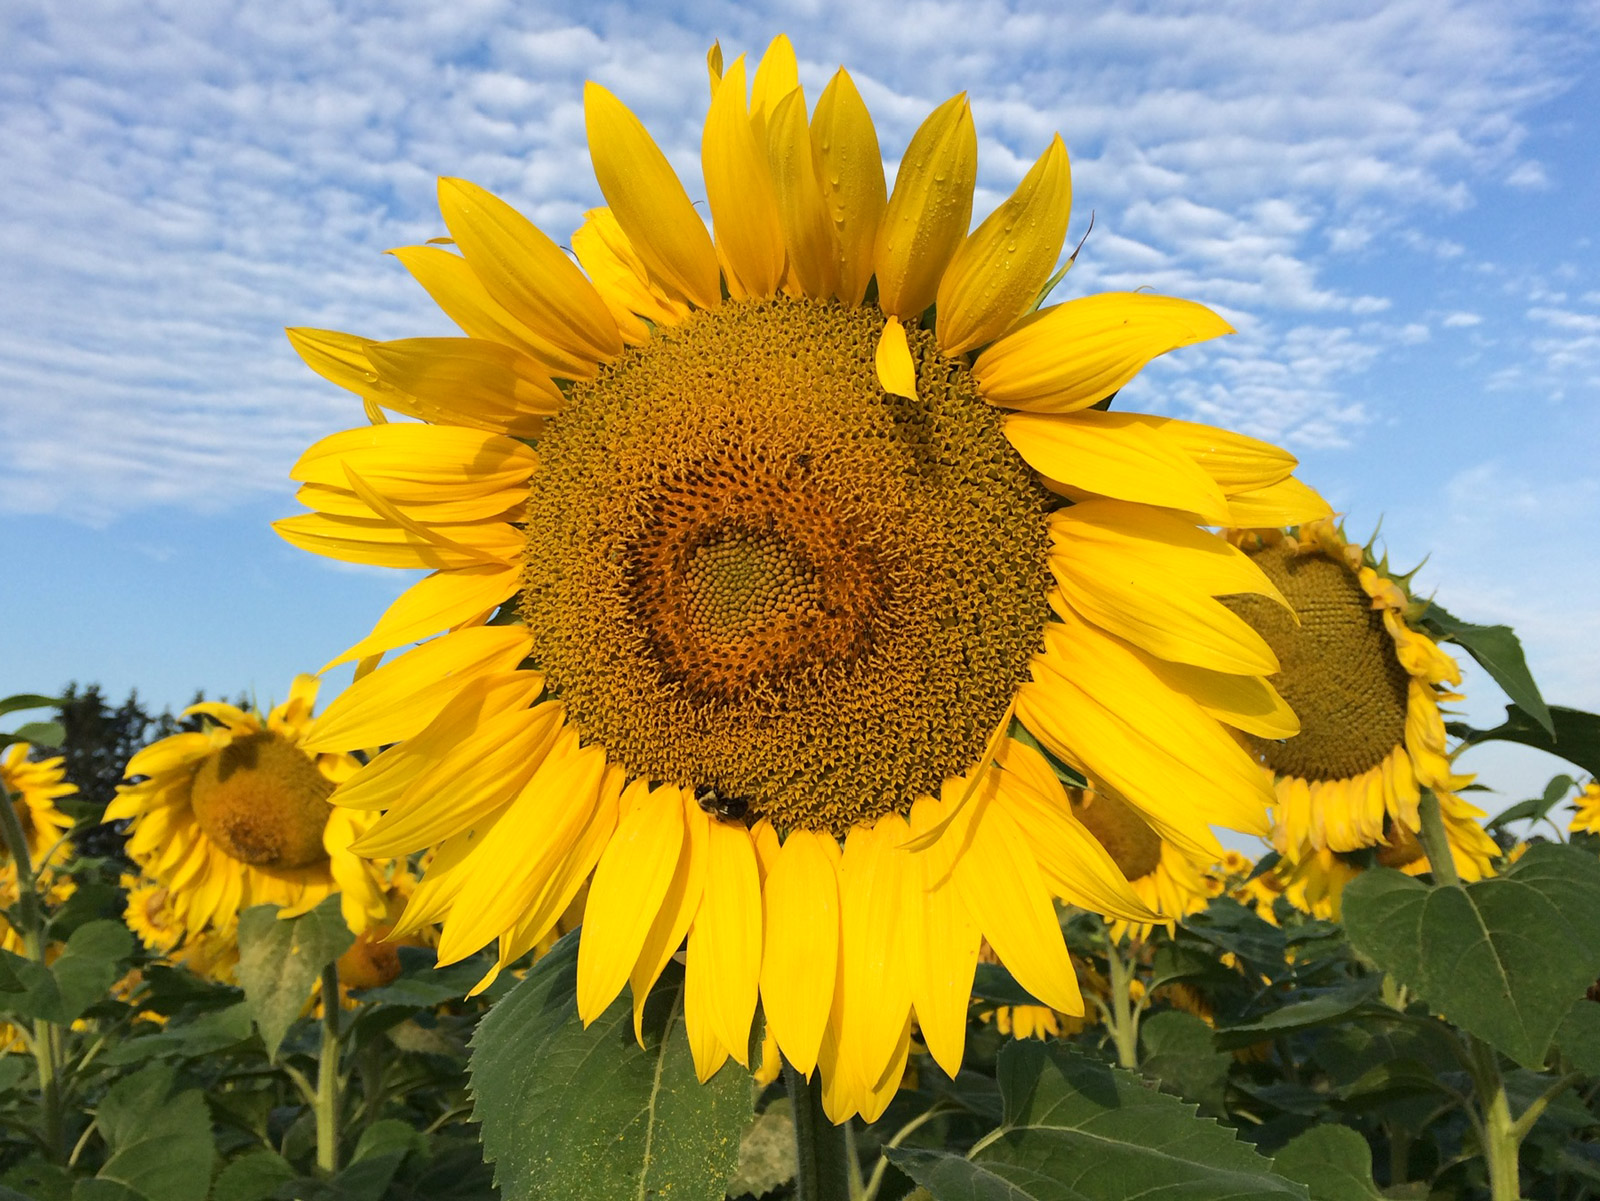 Large sunflower on Harshell Farm